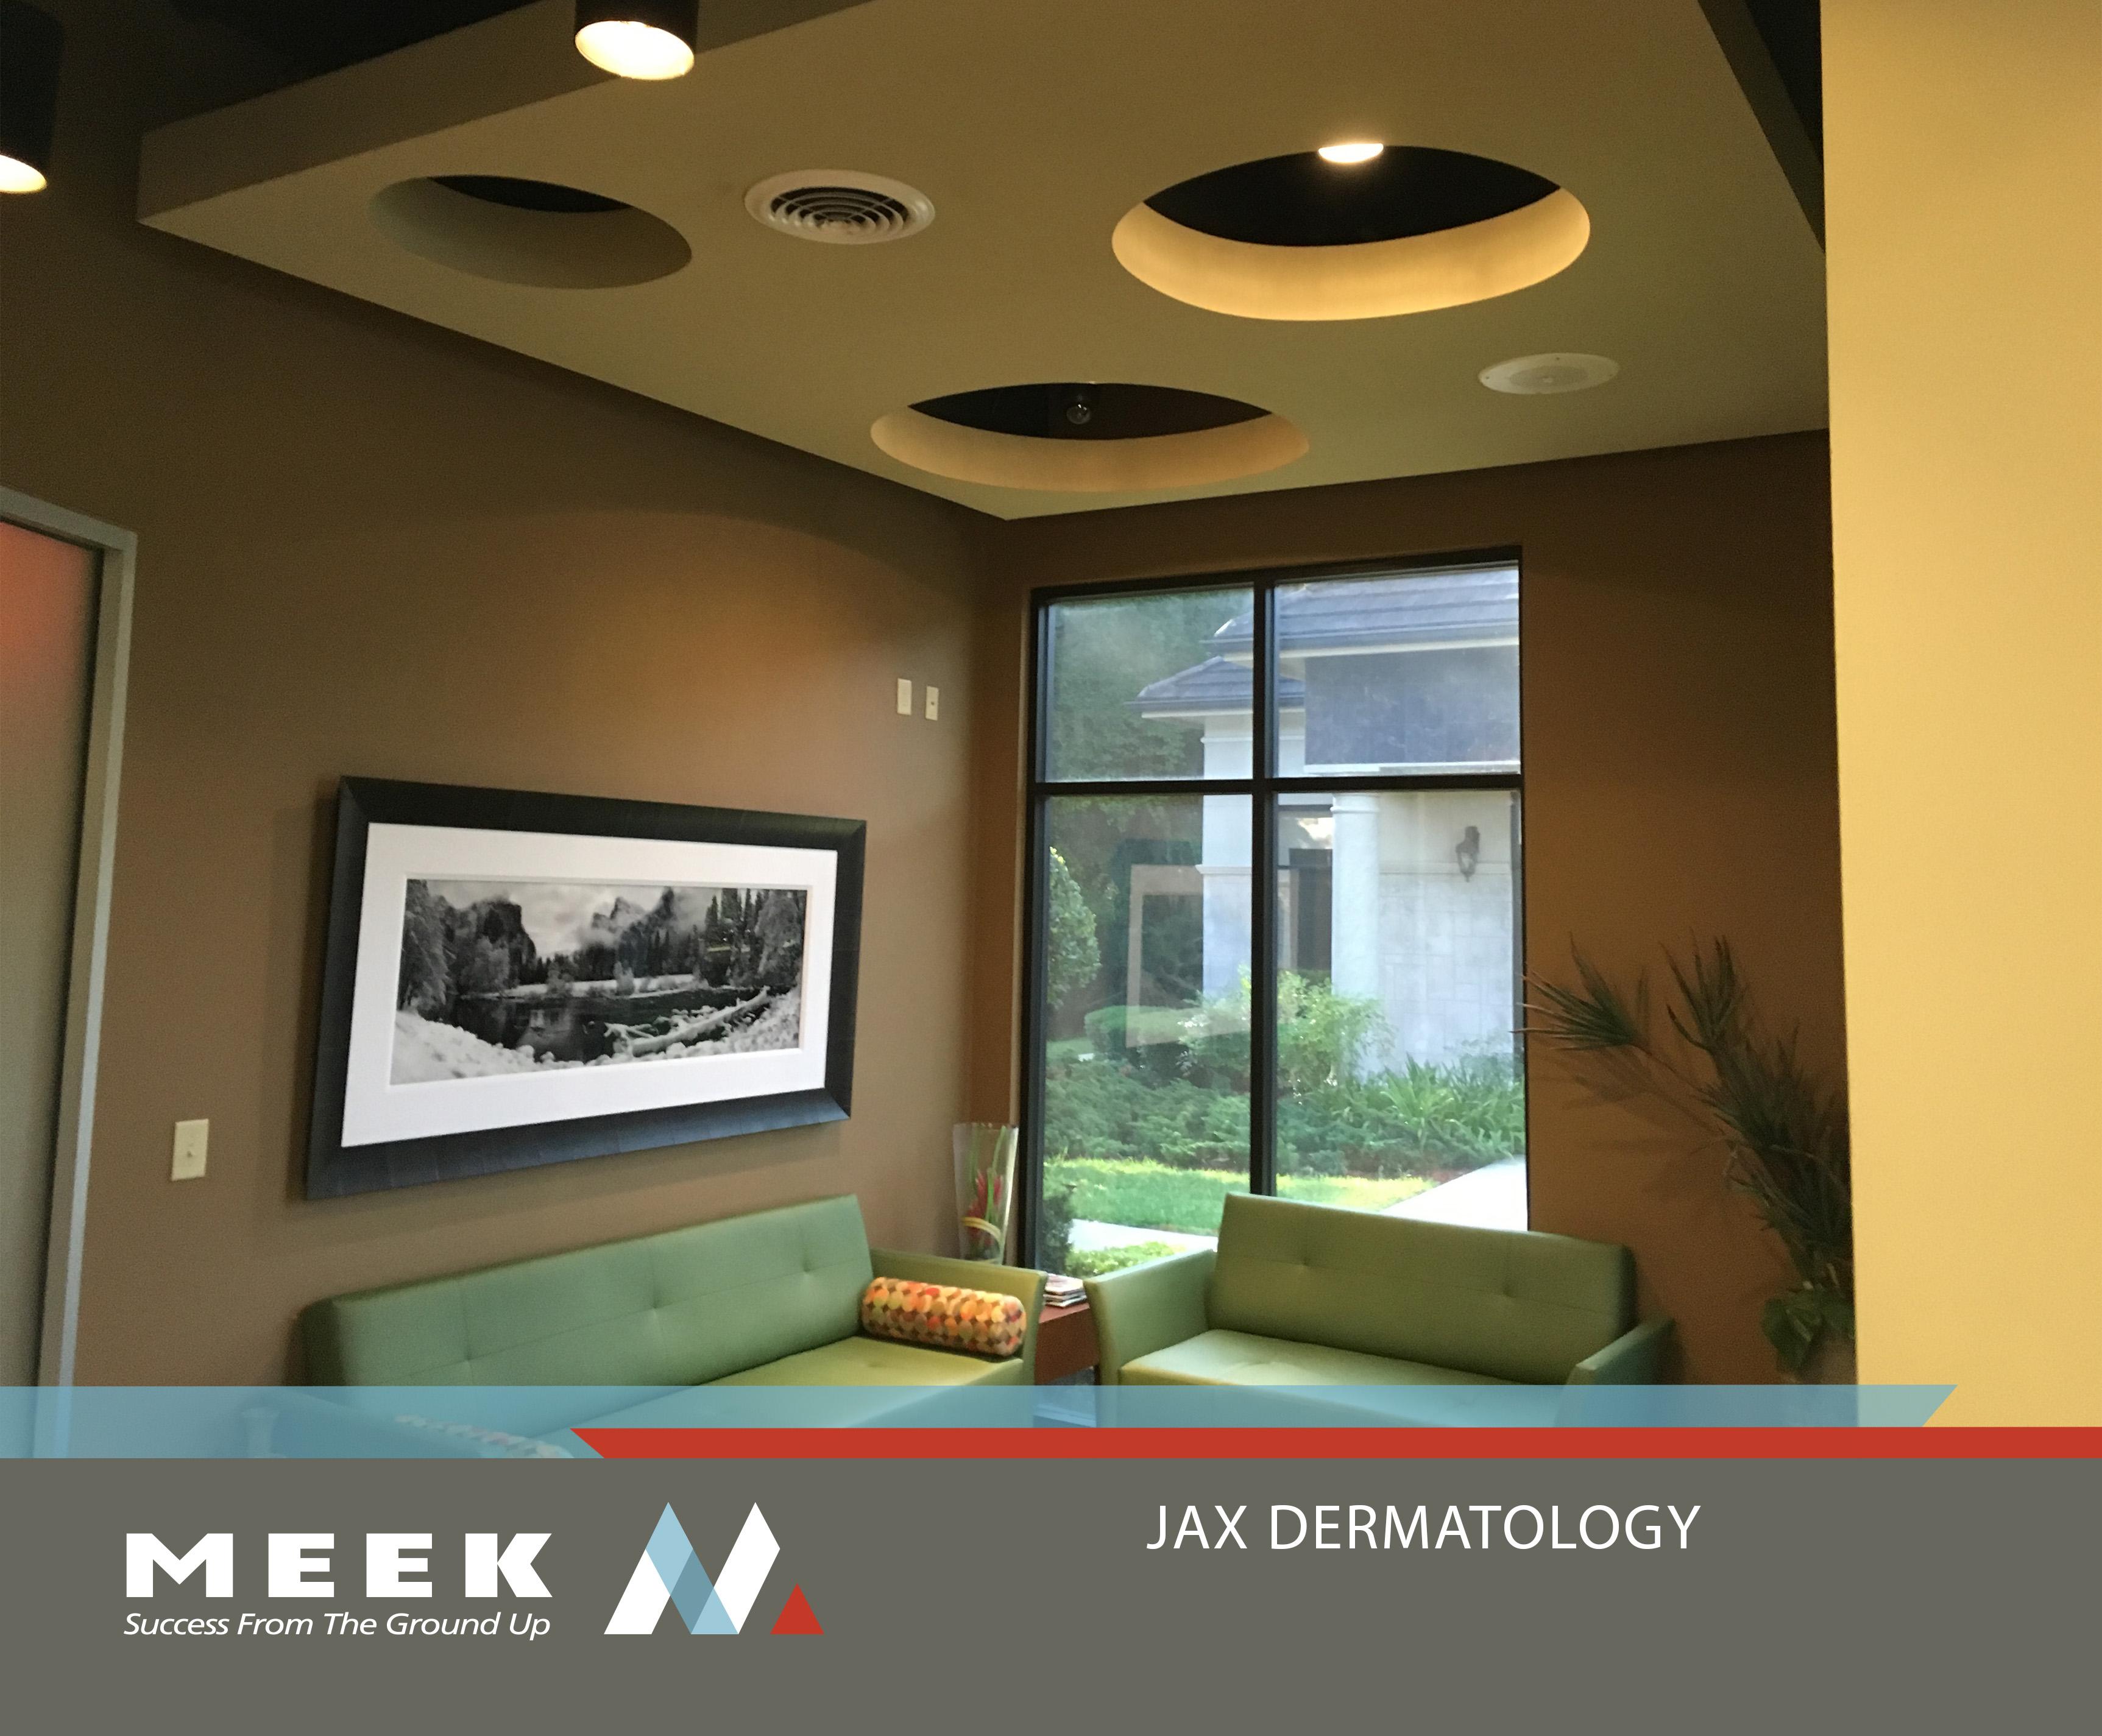 JAX Dermatology